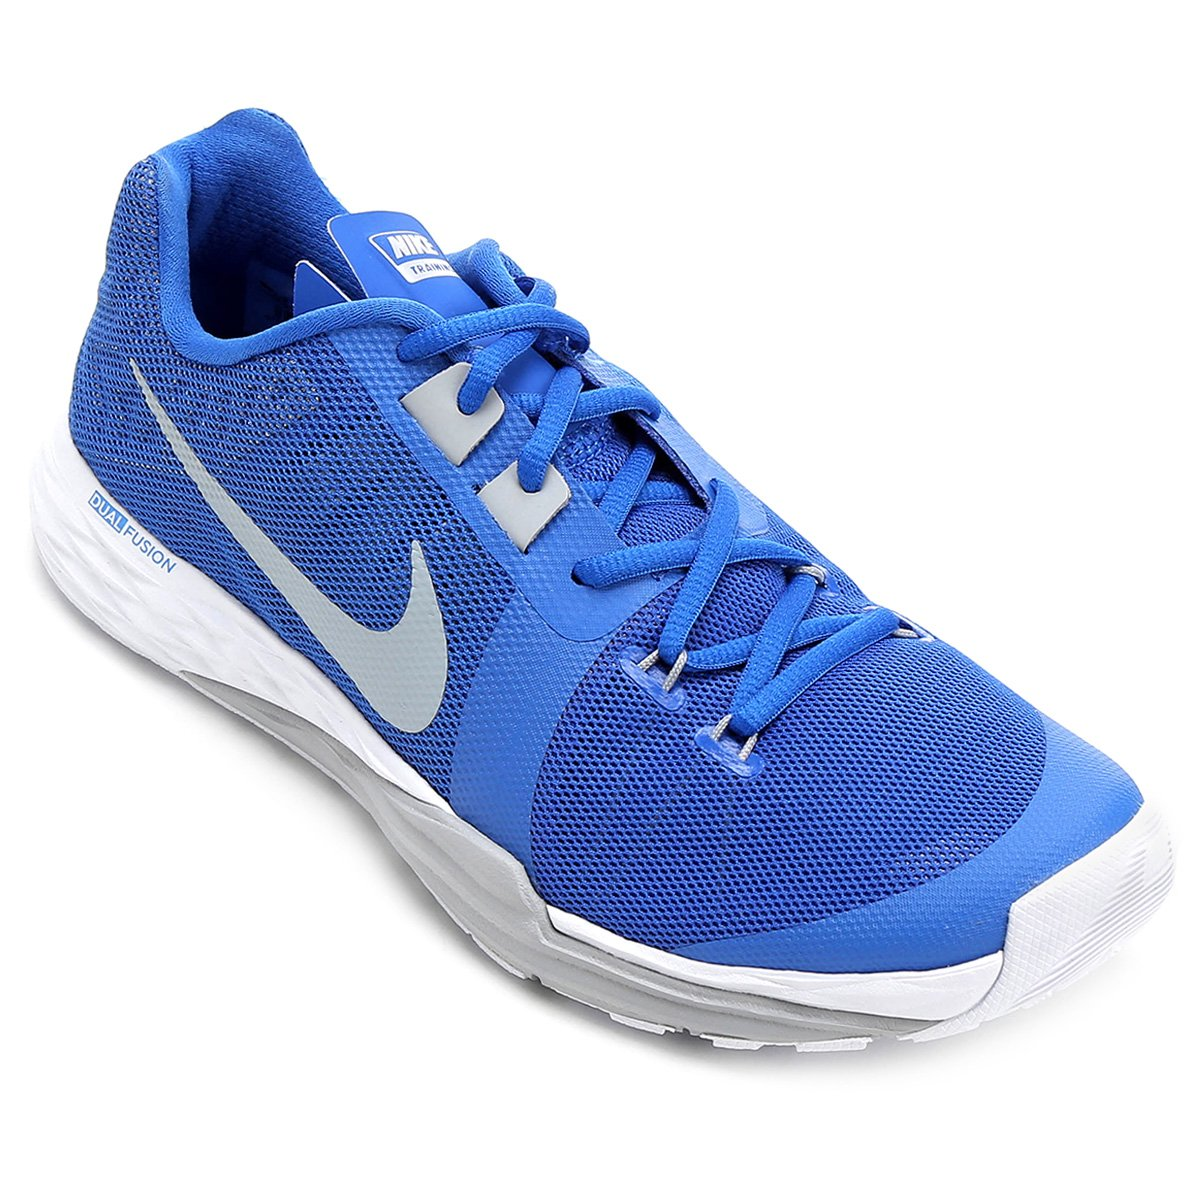 d7a31378cf6ee Tênis Nike Train Prime Iron DF Masculino - Compre Agora